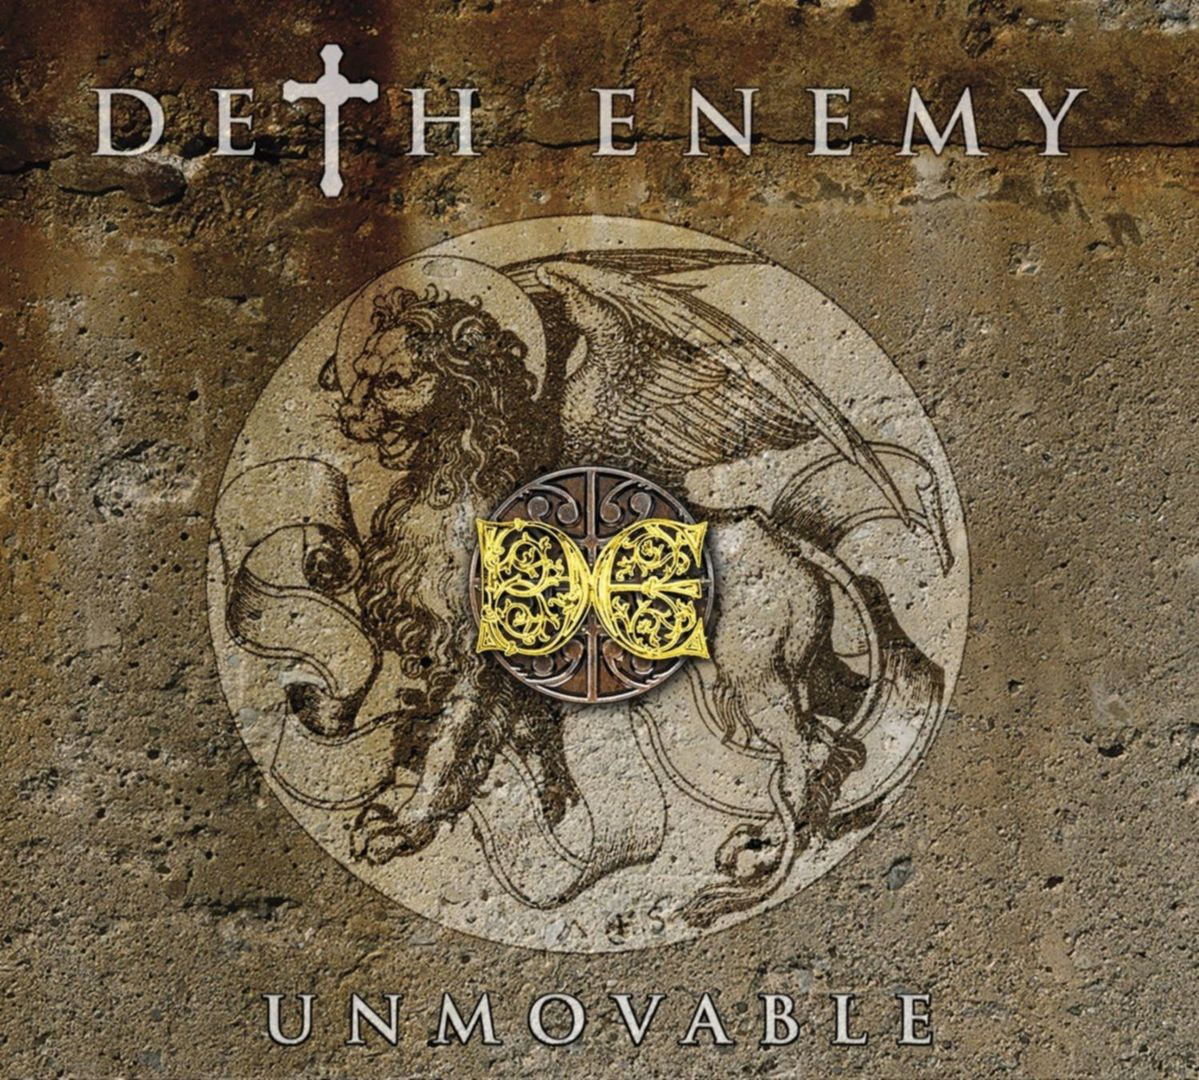 deth enemy